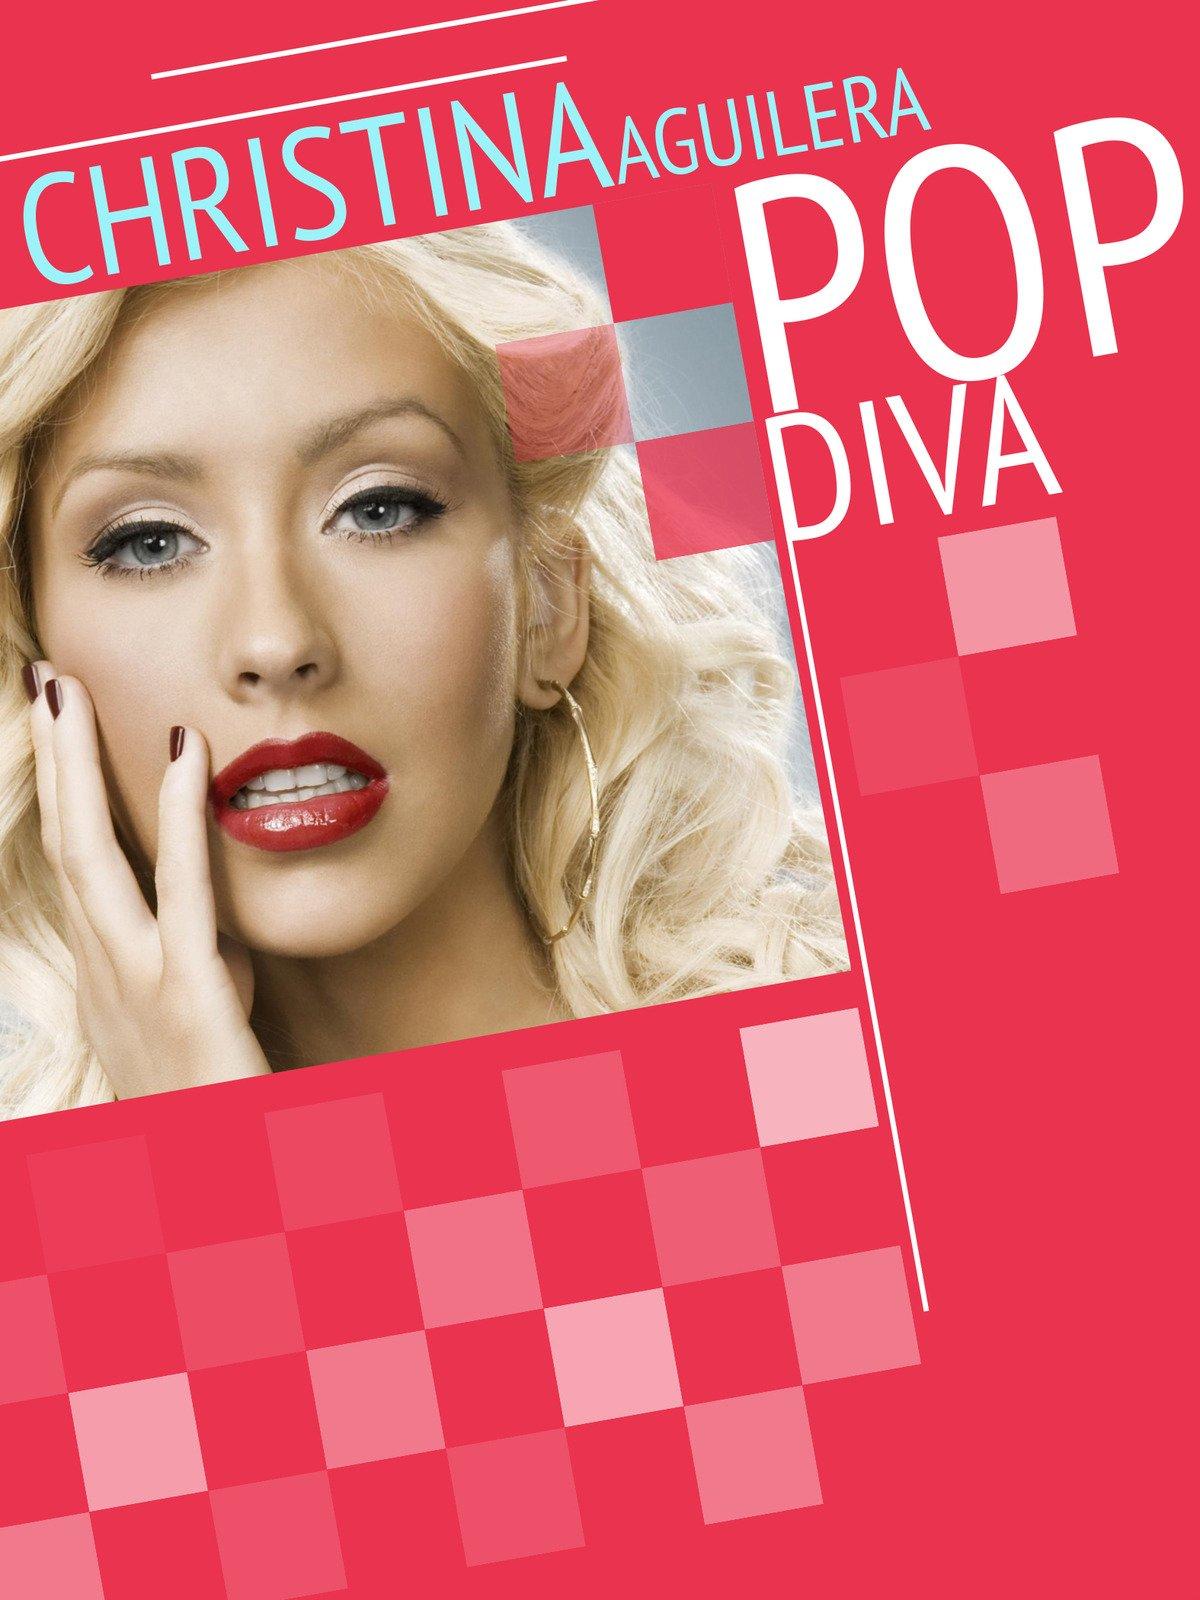 Christina Aguilera: Pop Diva on Amazon Prime Video UK